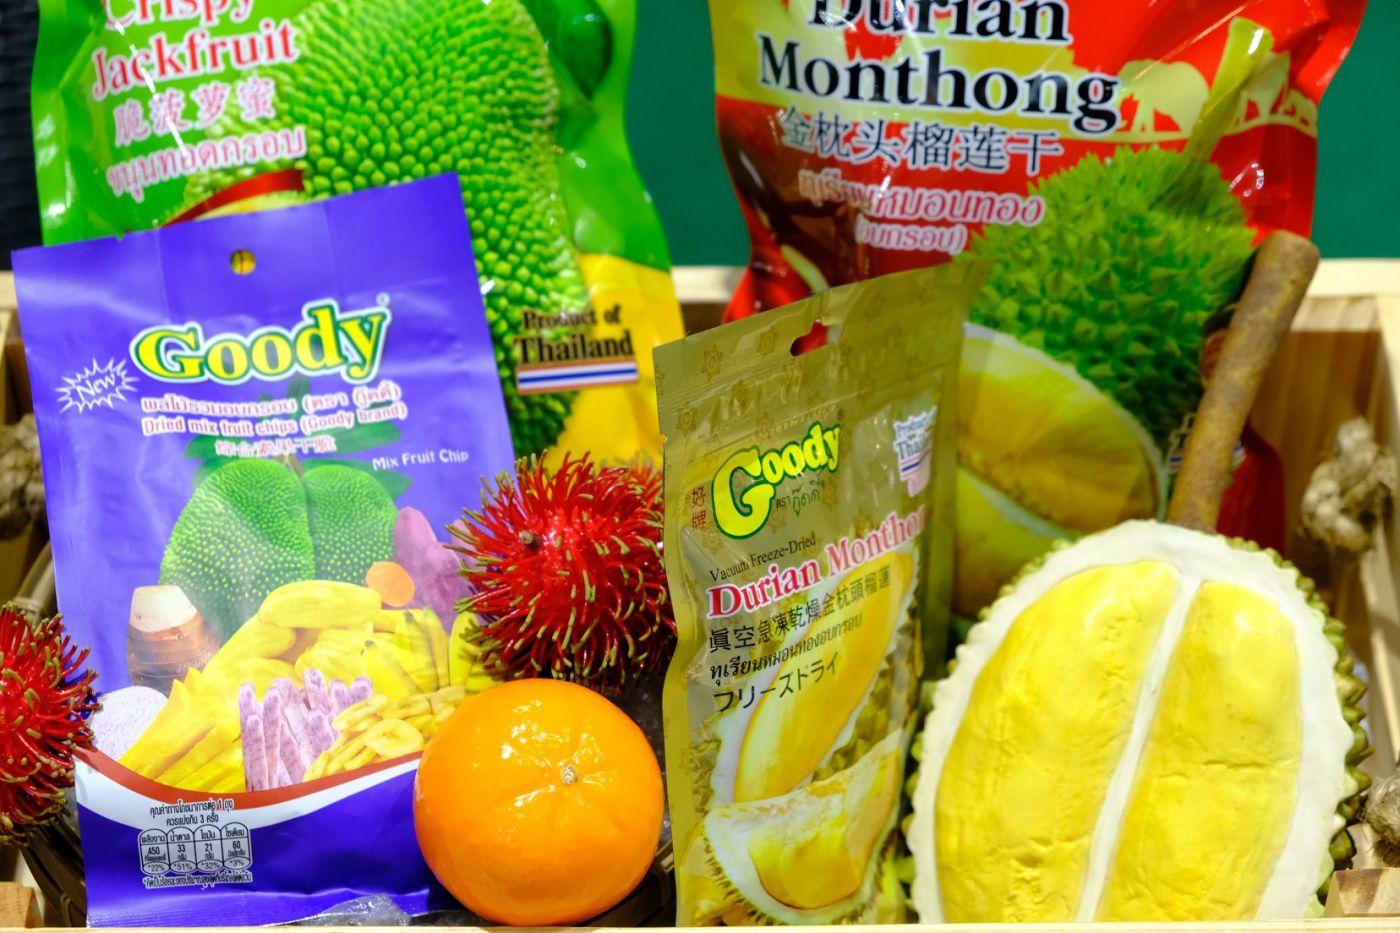 DITP ชี้สินค้าของทานเล่นที่ทำด้วยผลไม้ มีโอกาสส่งออกตลาดสหรัฐฯ ได้เพิ่มขึ้น